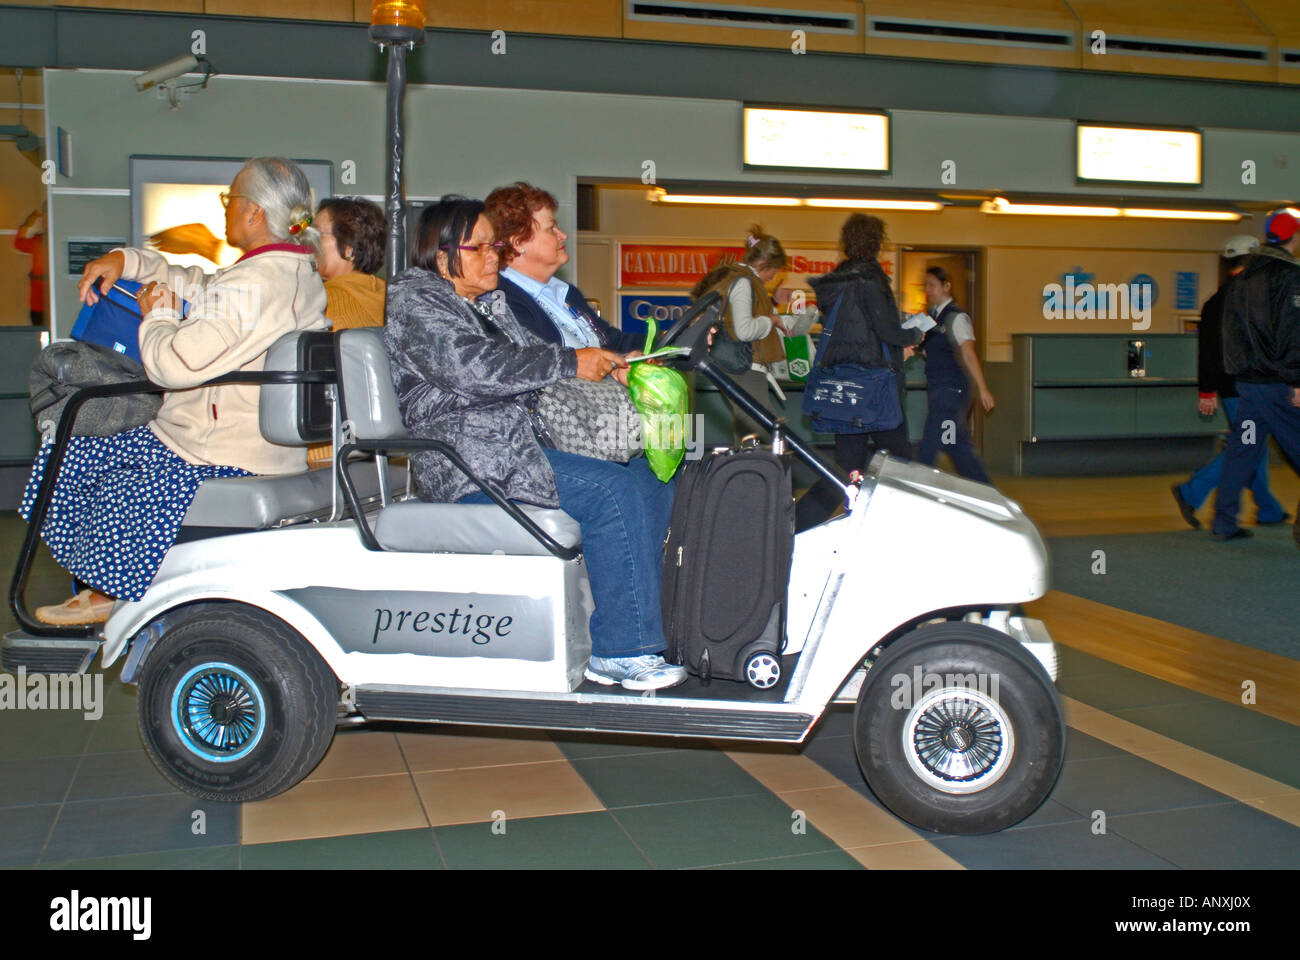 Buggy Car Airport